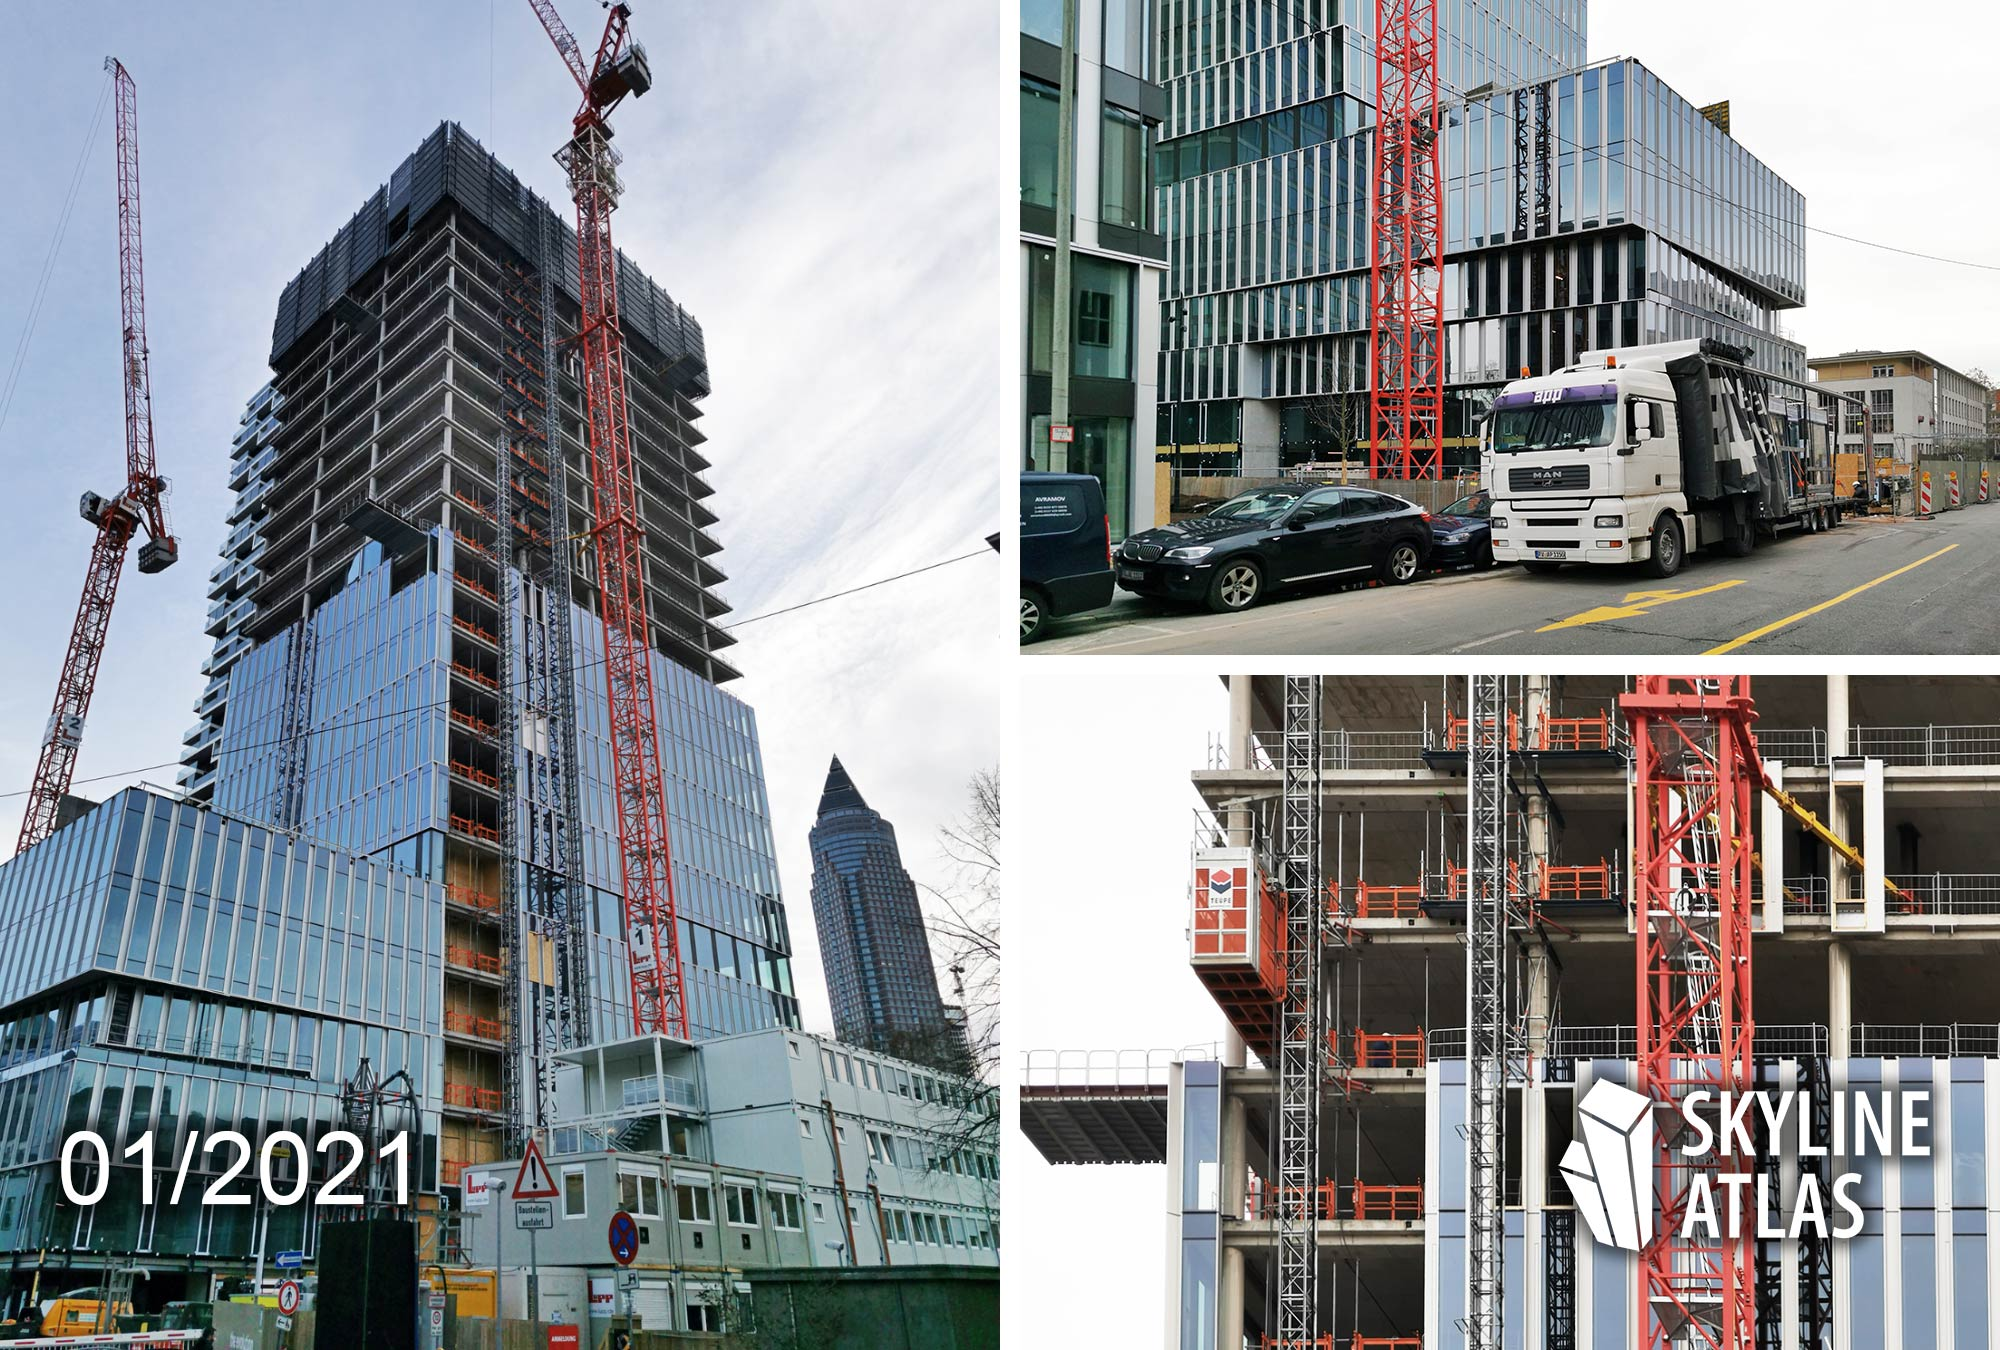 Senckenbergturm Frankfurt - Senckenberg Turm - Kulturcampus Turm - Tower 99 - Bauarbeiten Januar 2021 - Baustelle 2021